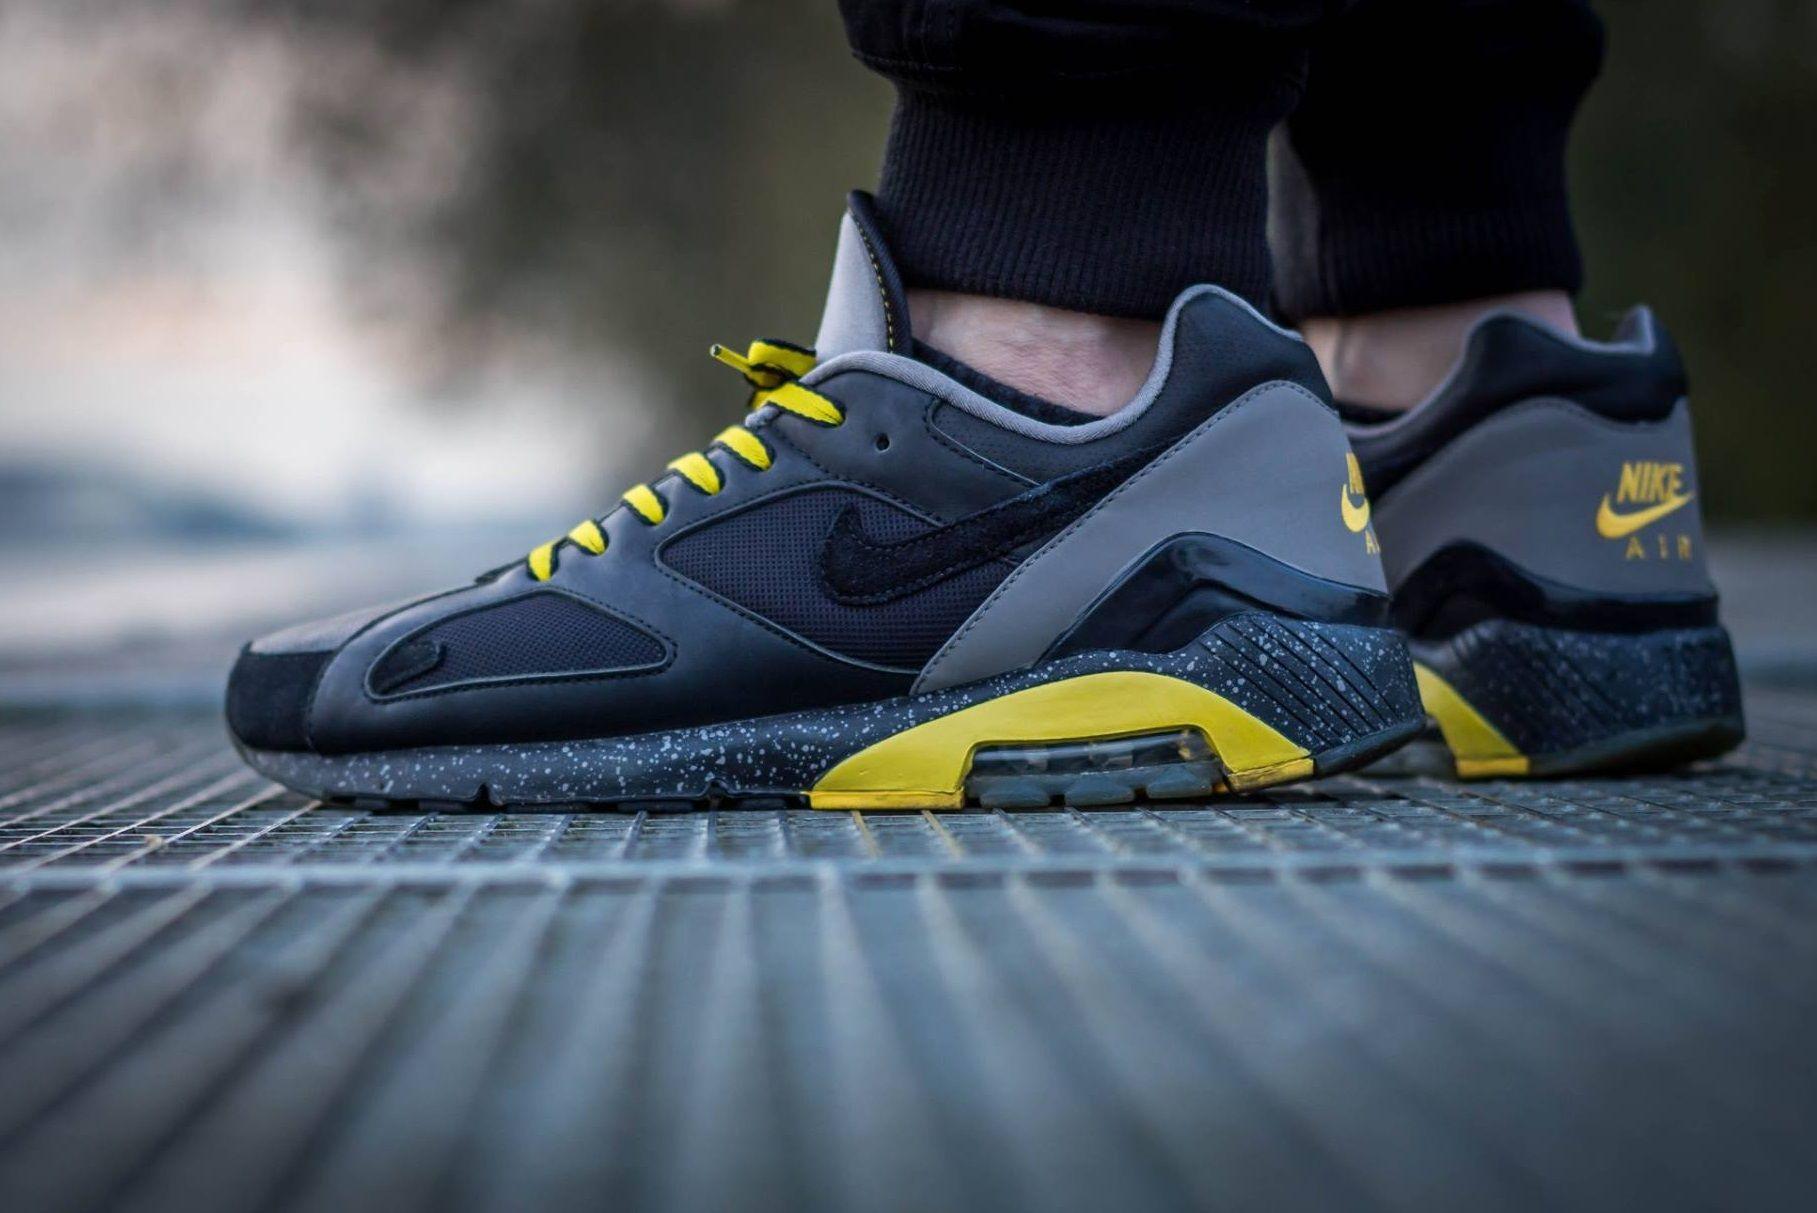 separation shoes 97507 2fefa Nike Air Max 180  Livestrong